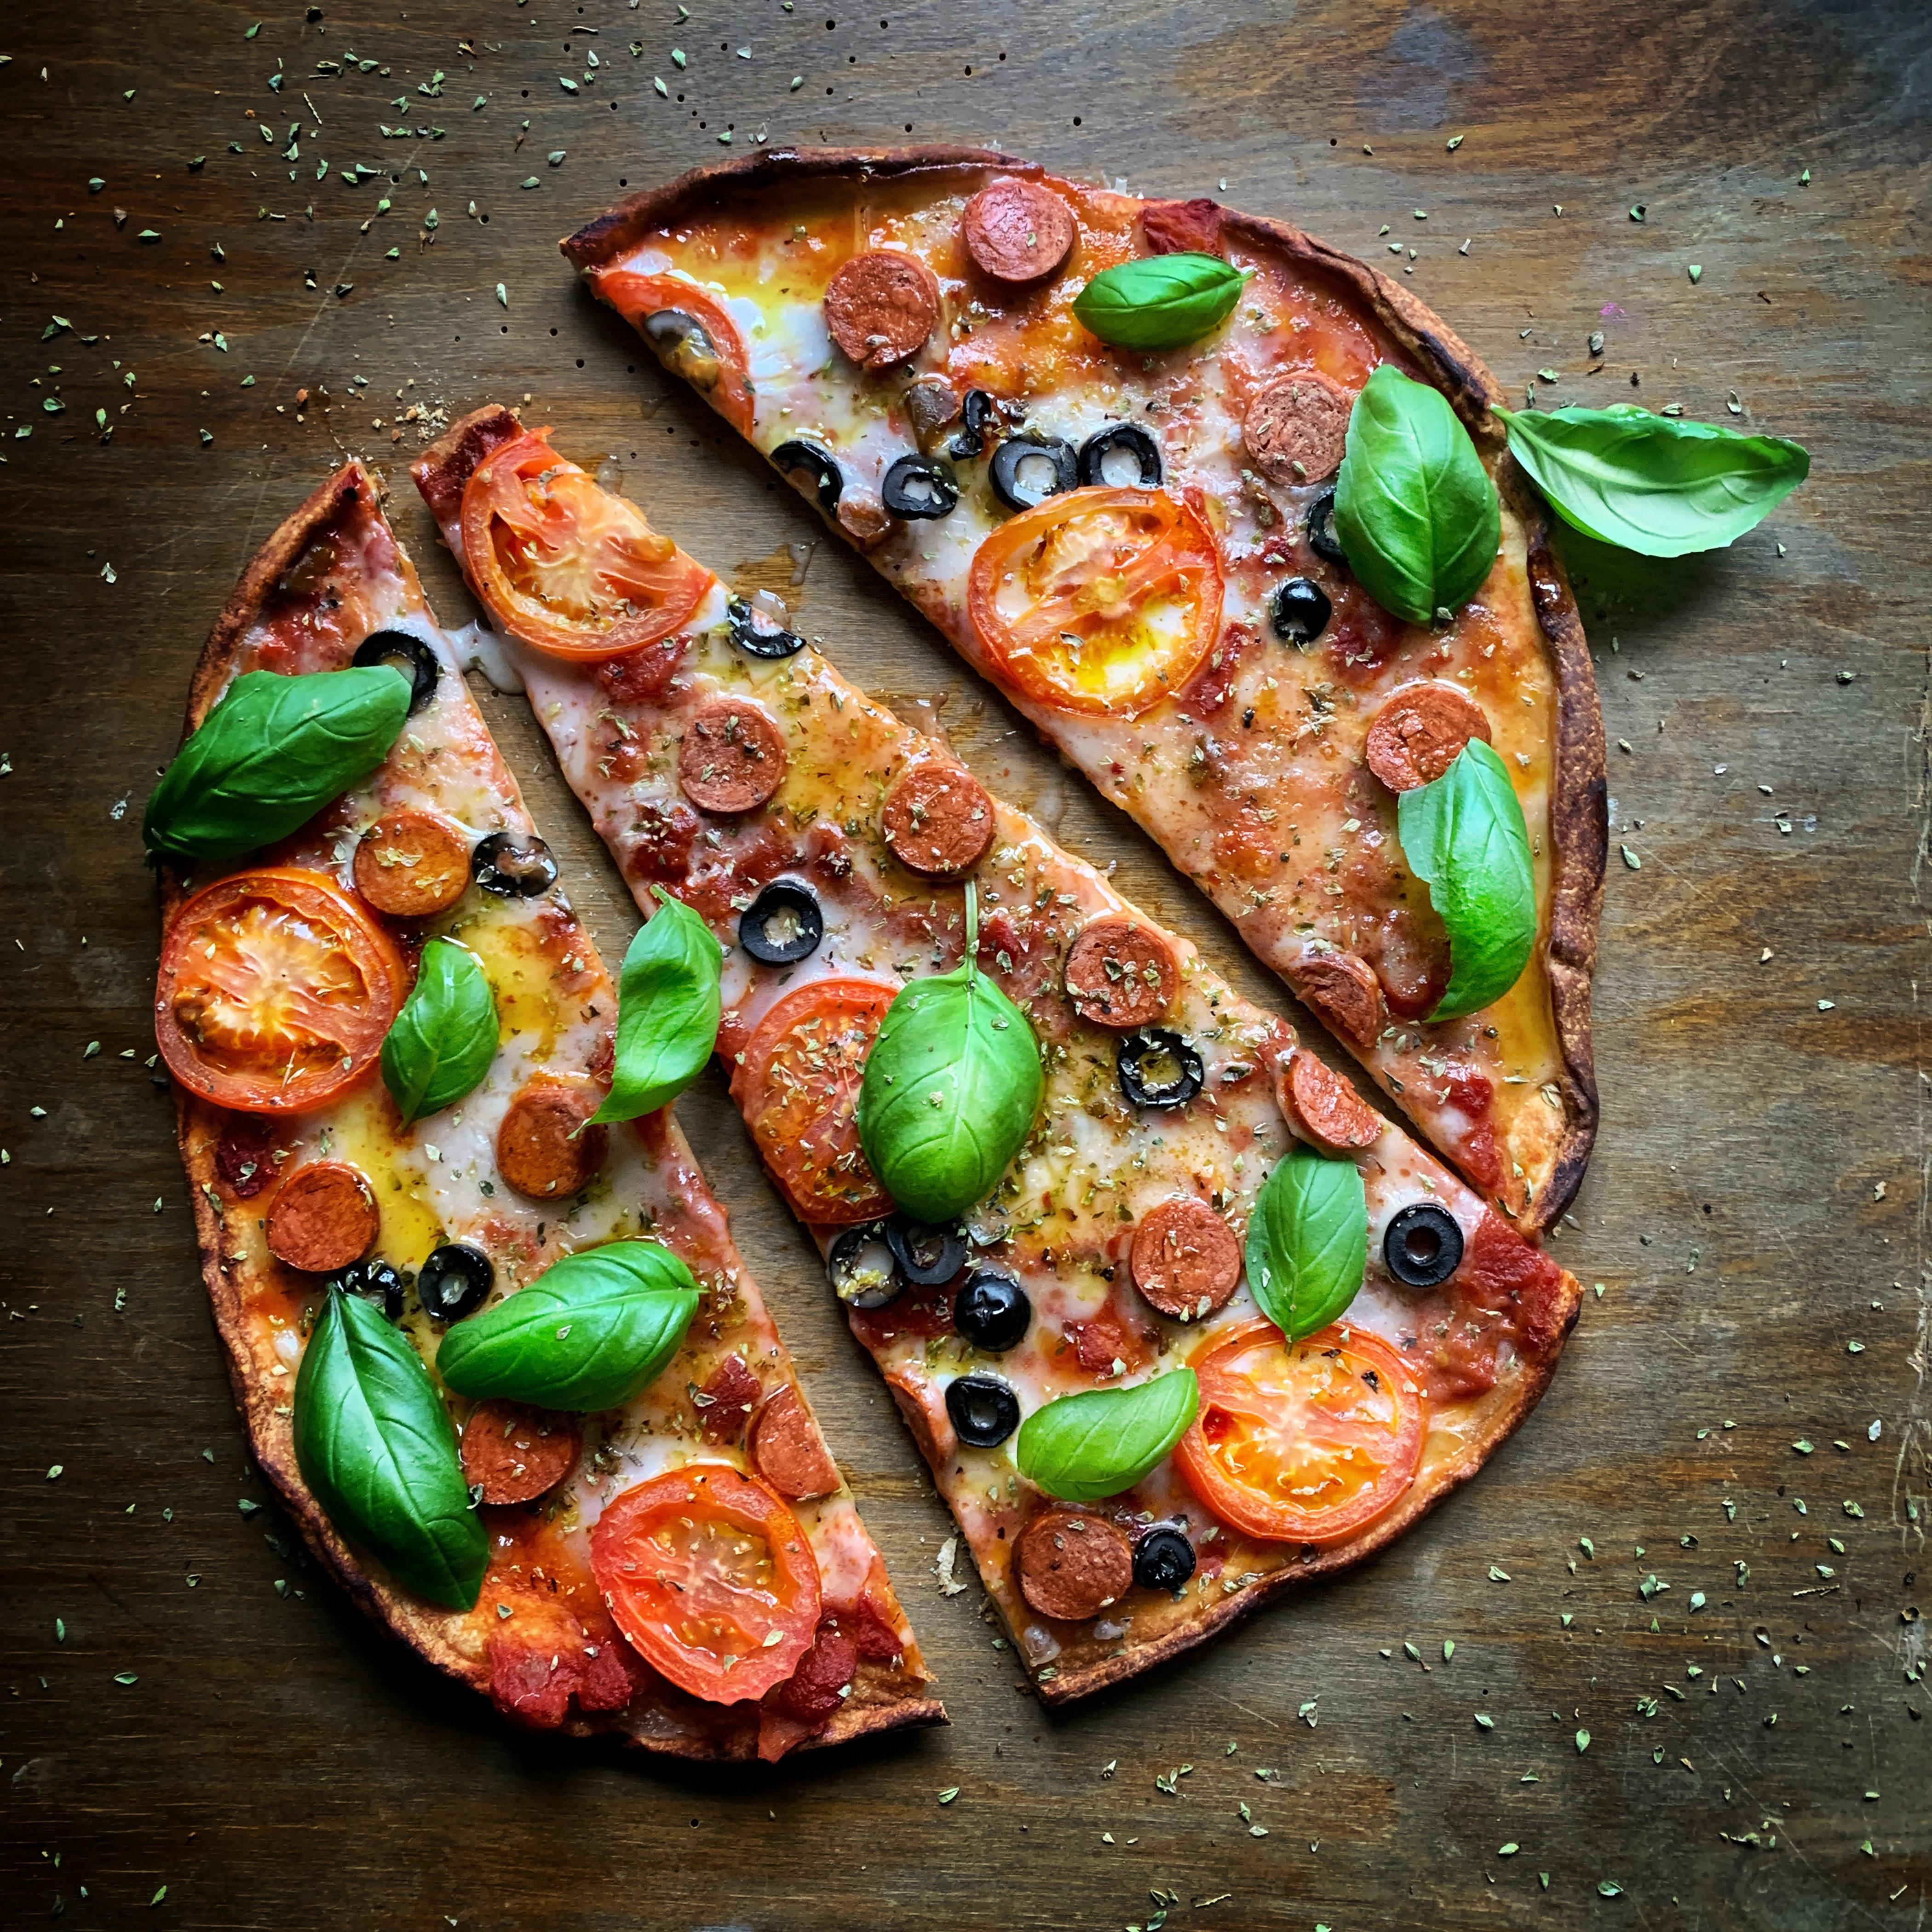 Big Data Drives Pizza Choices